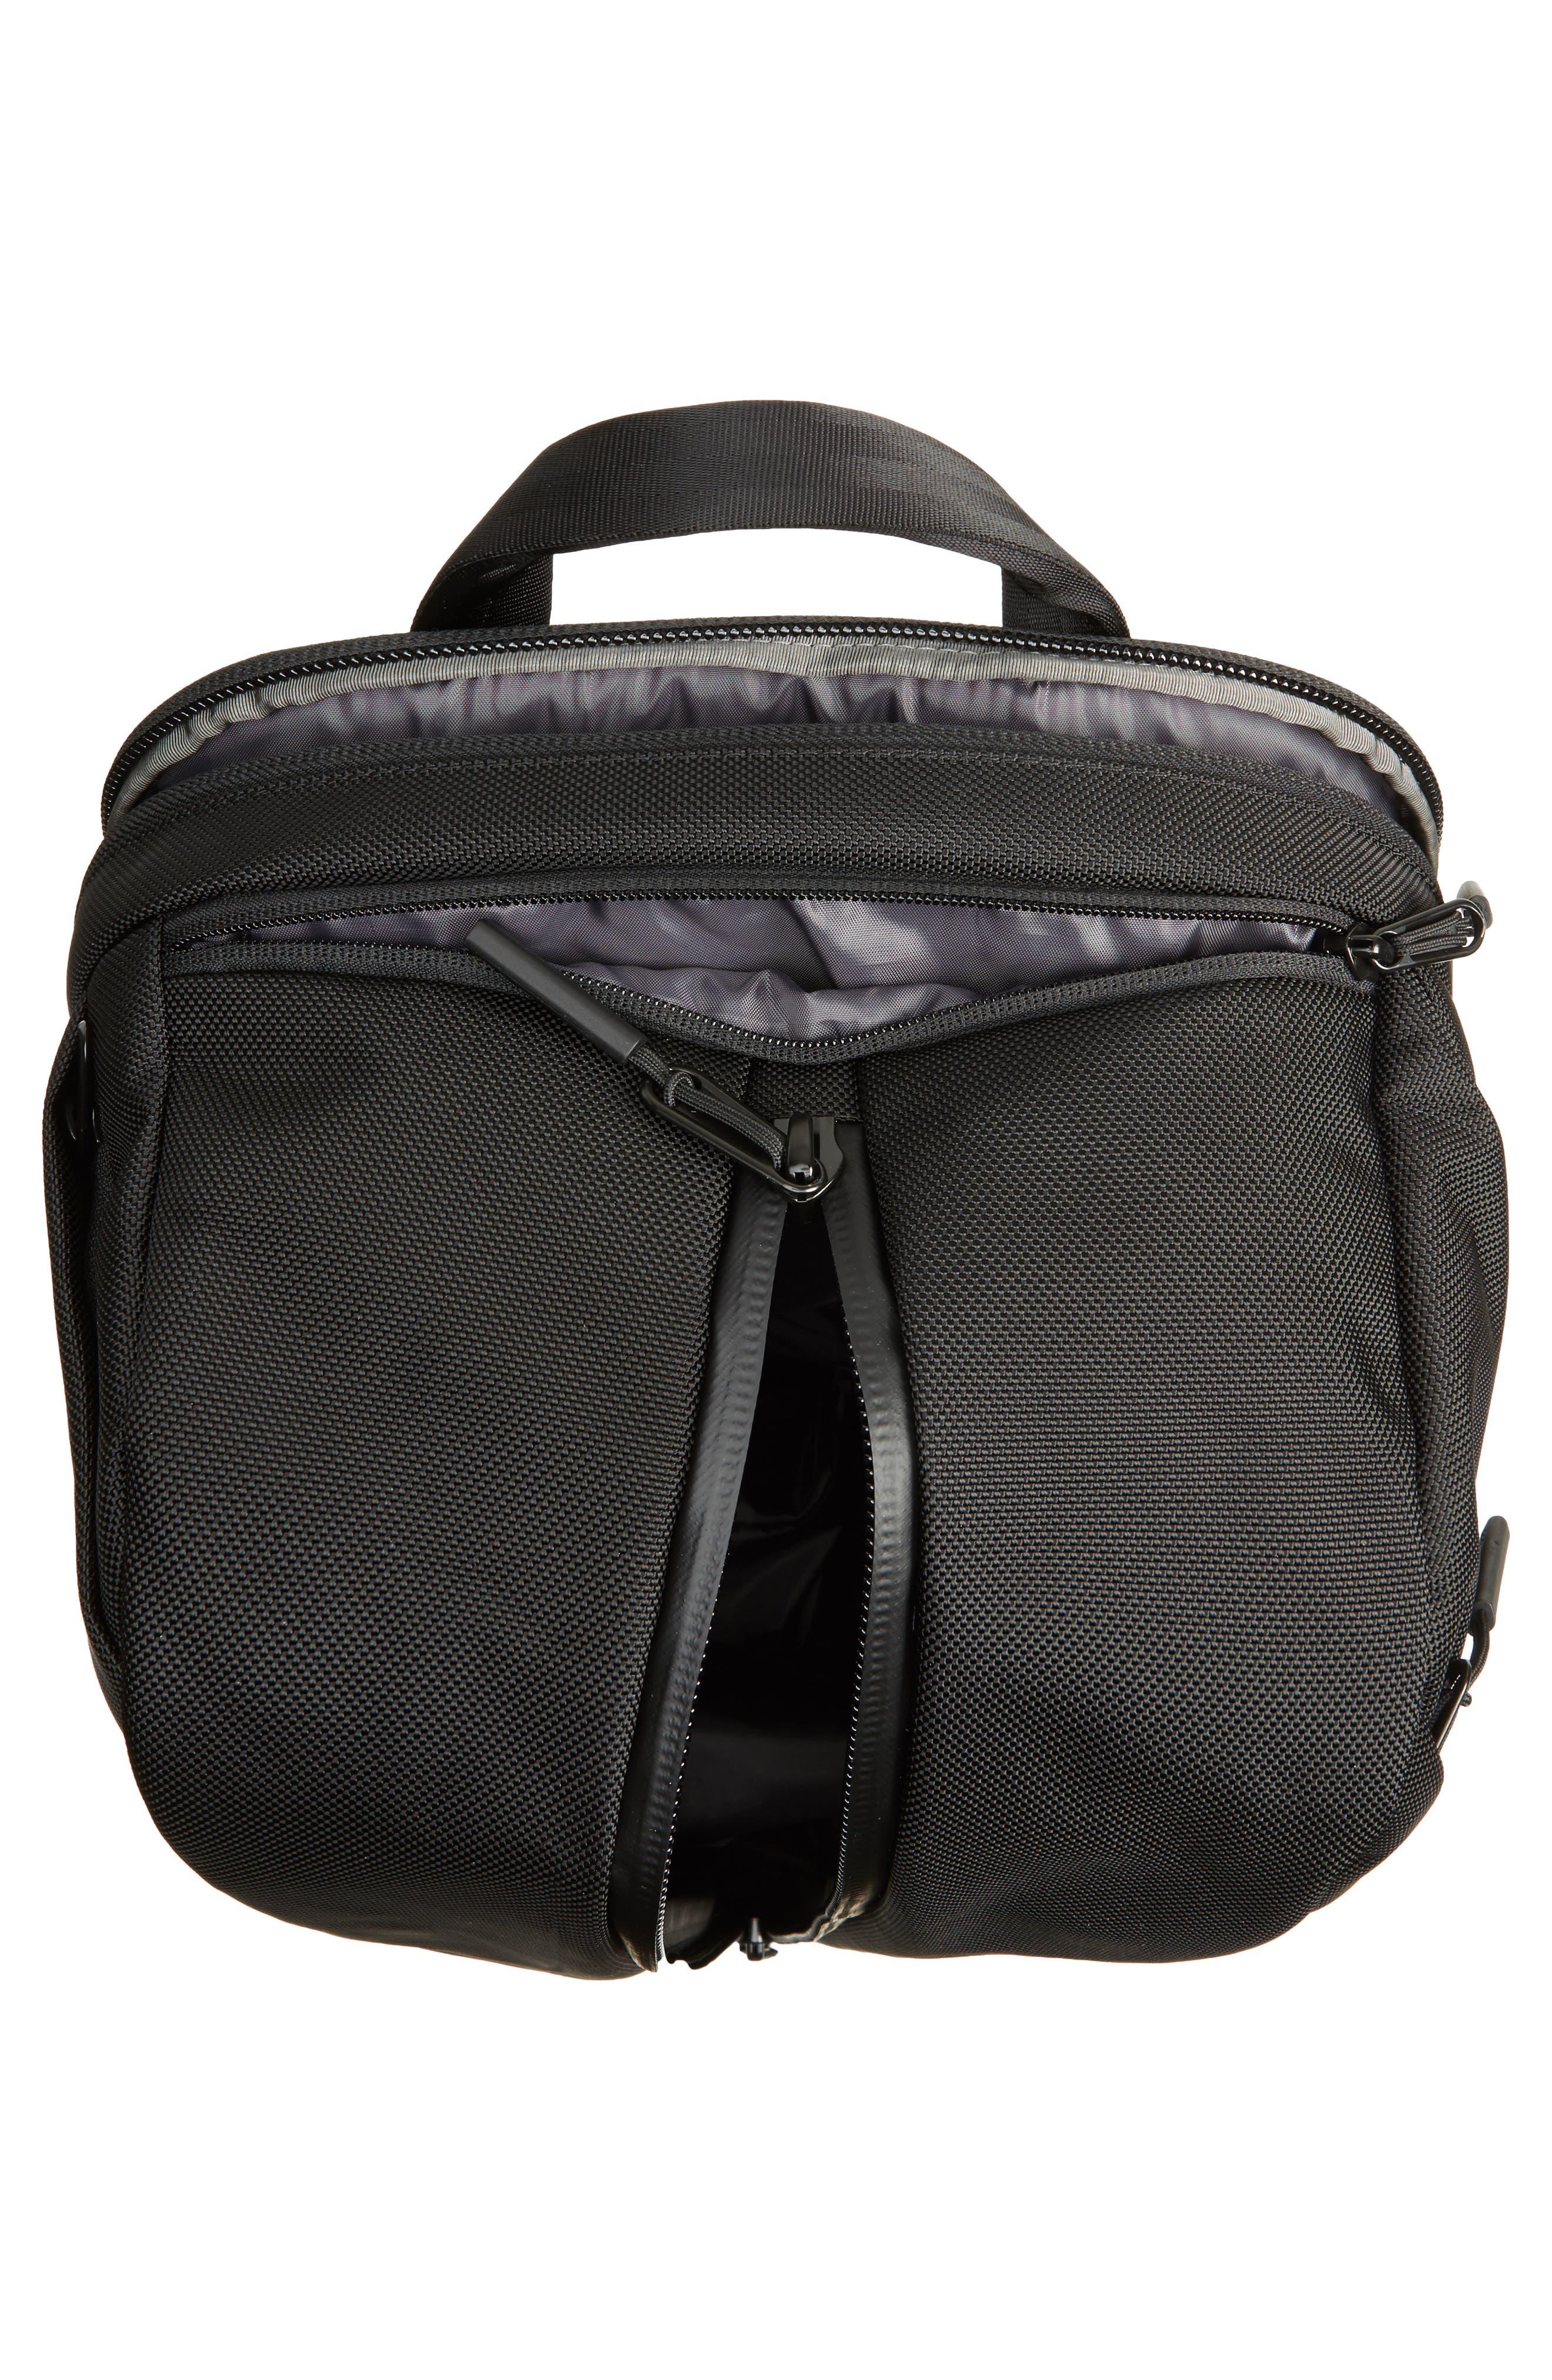 Duffel Pack 2 Convertible Backpack,                             Alternate thumbnail 4, color,                             BLACK